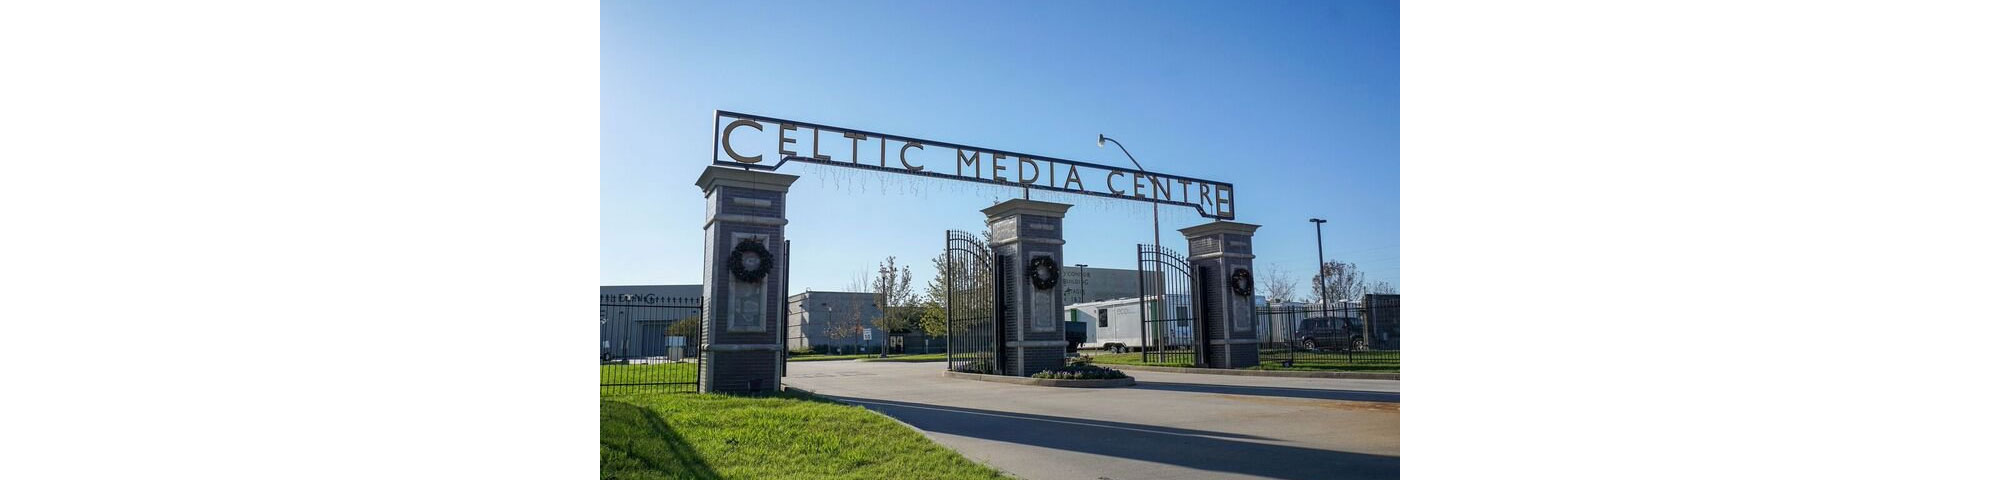 The Celtic Media Centre entrance.